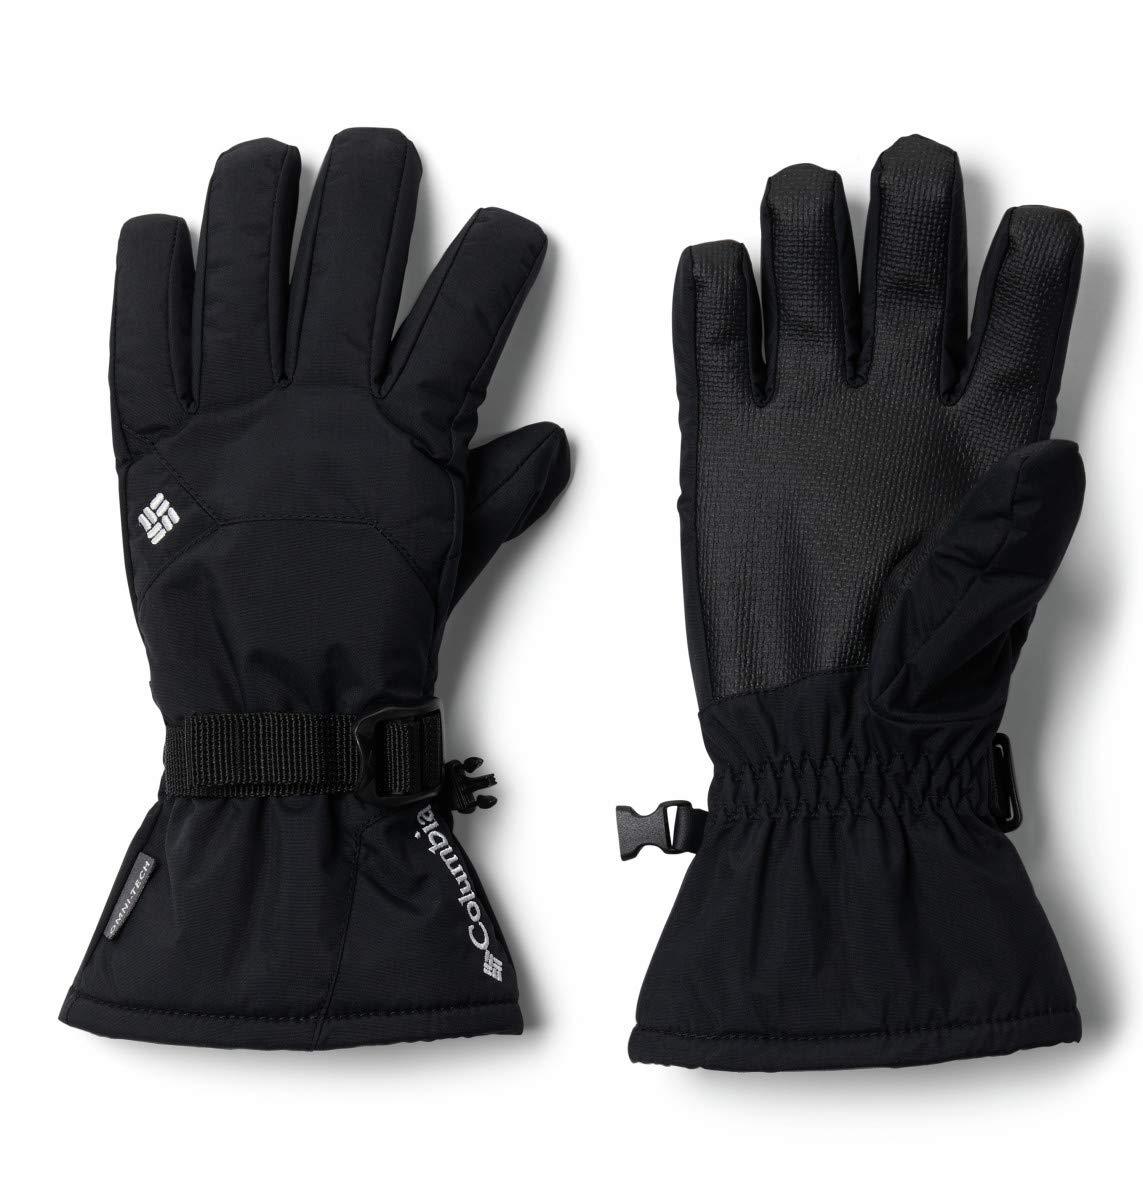 Columbia Kinder, Whirlibird, Handschuhe